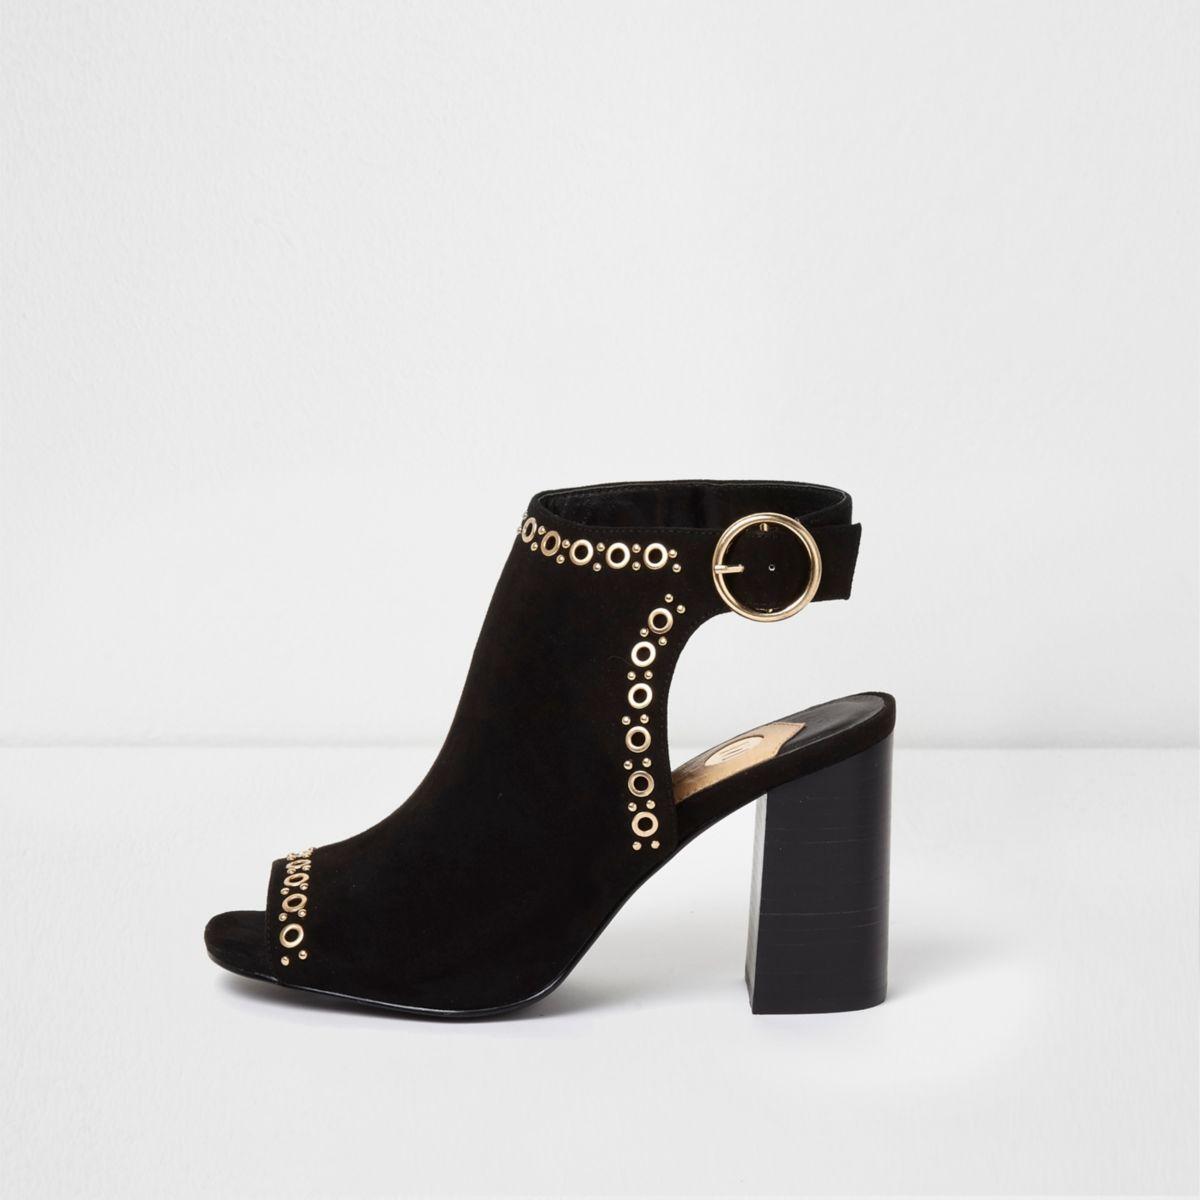 Black eyelet stud block heel shoe boots